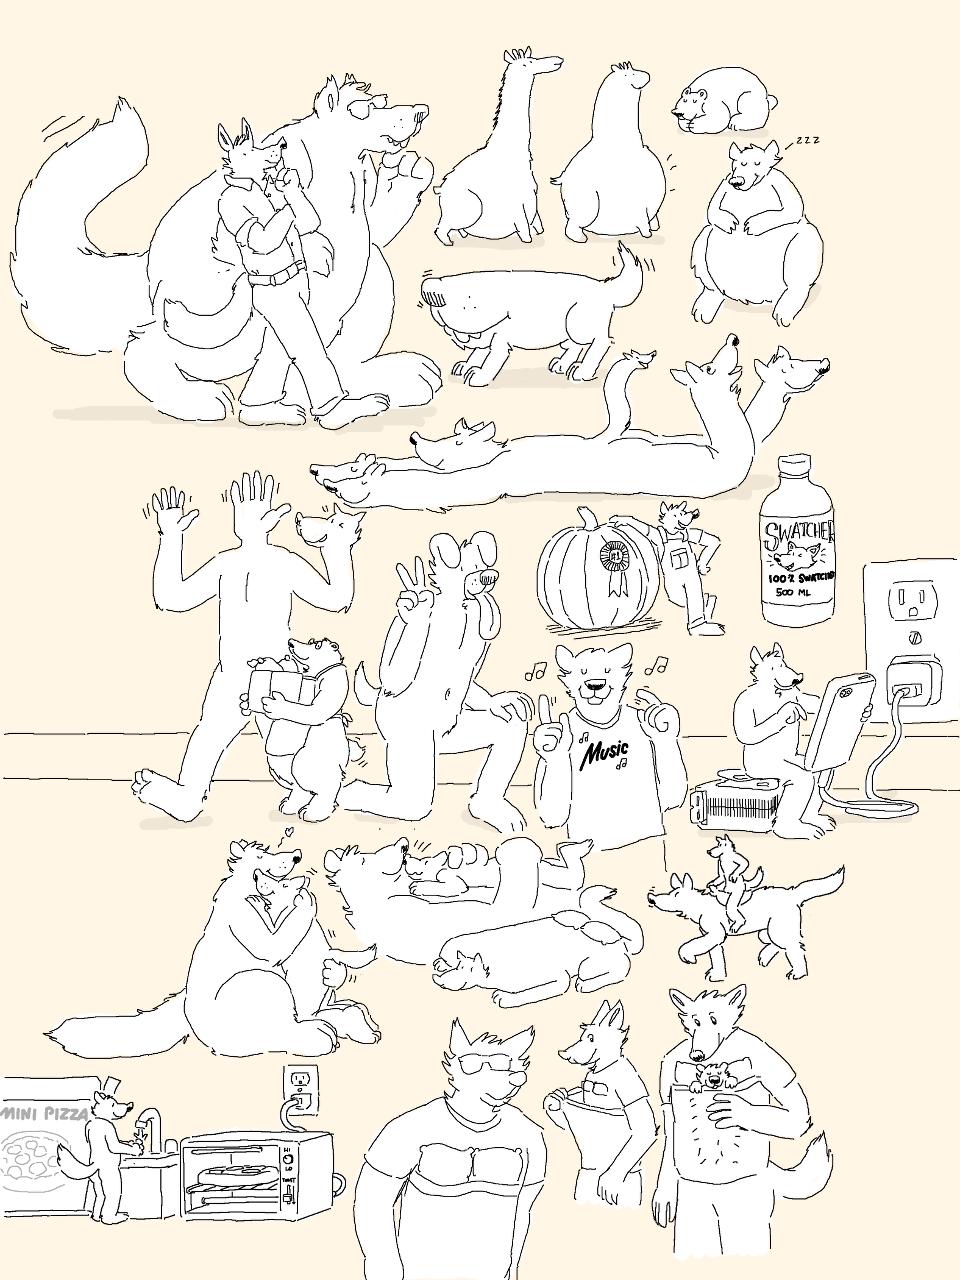 Micro doodles